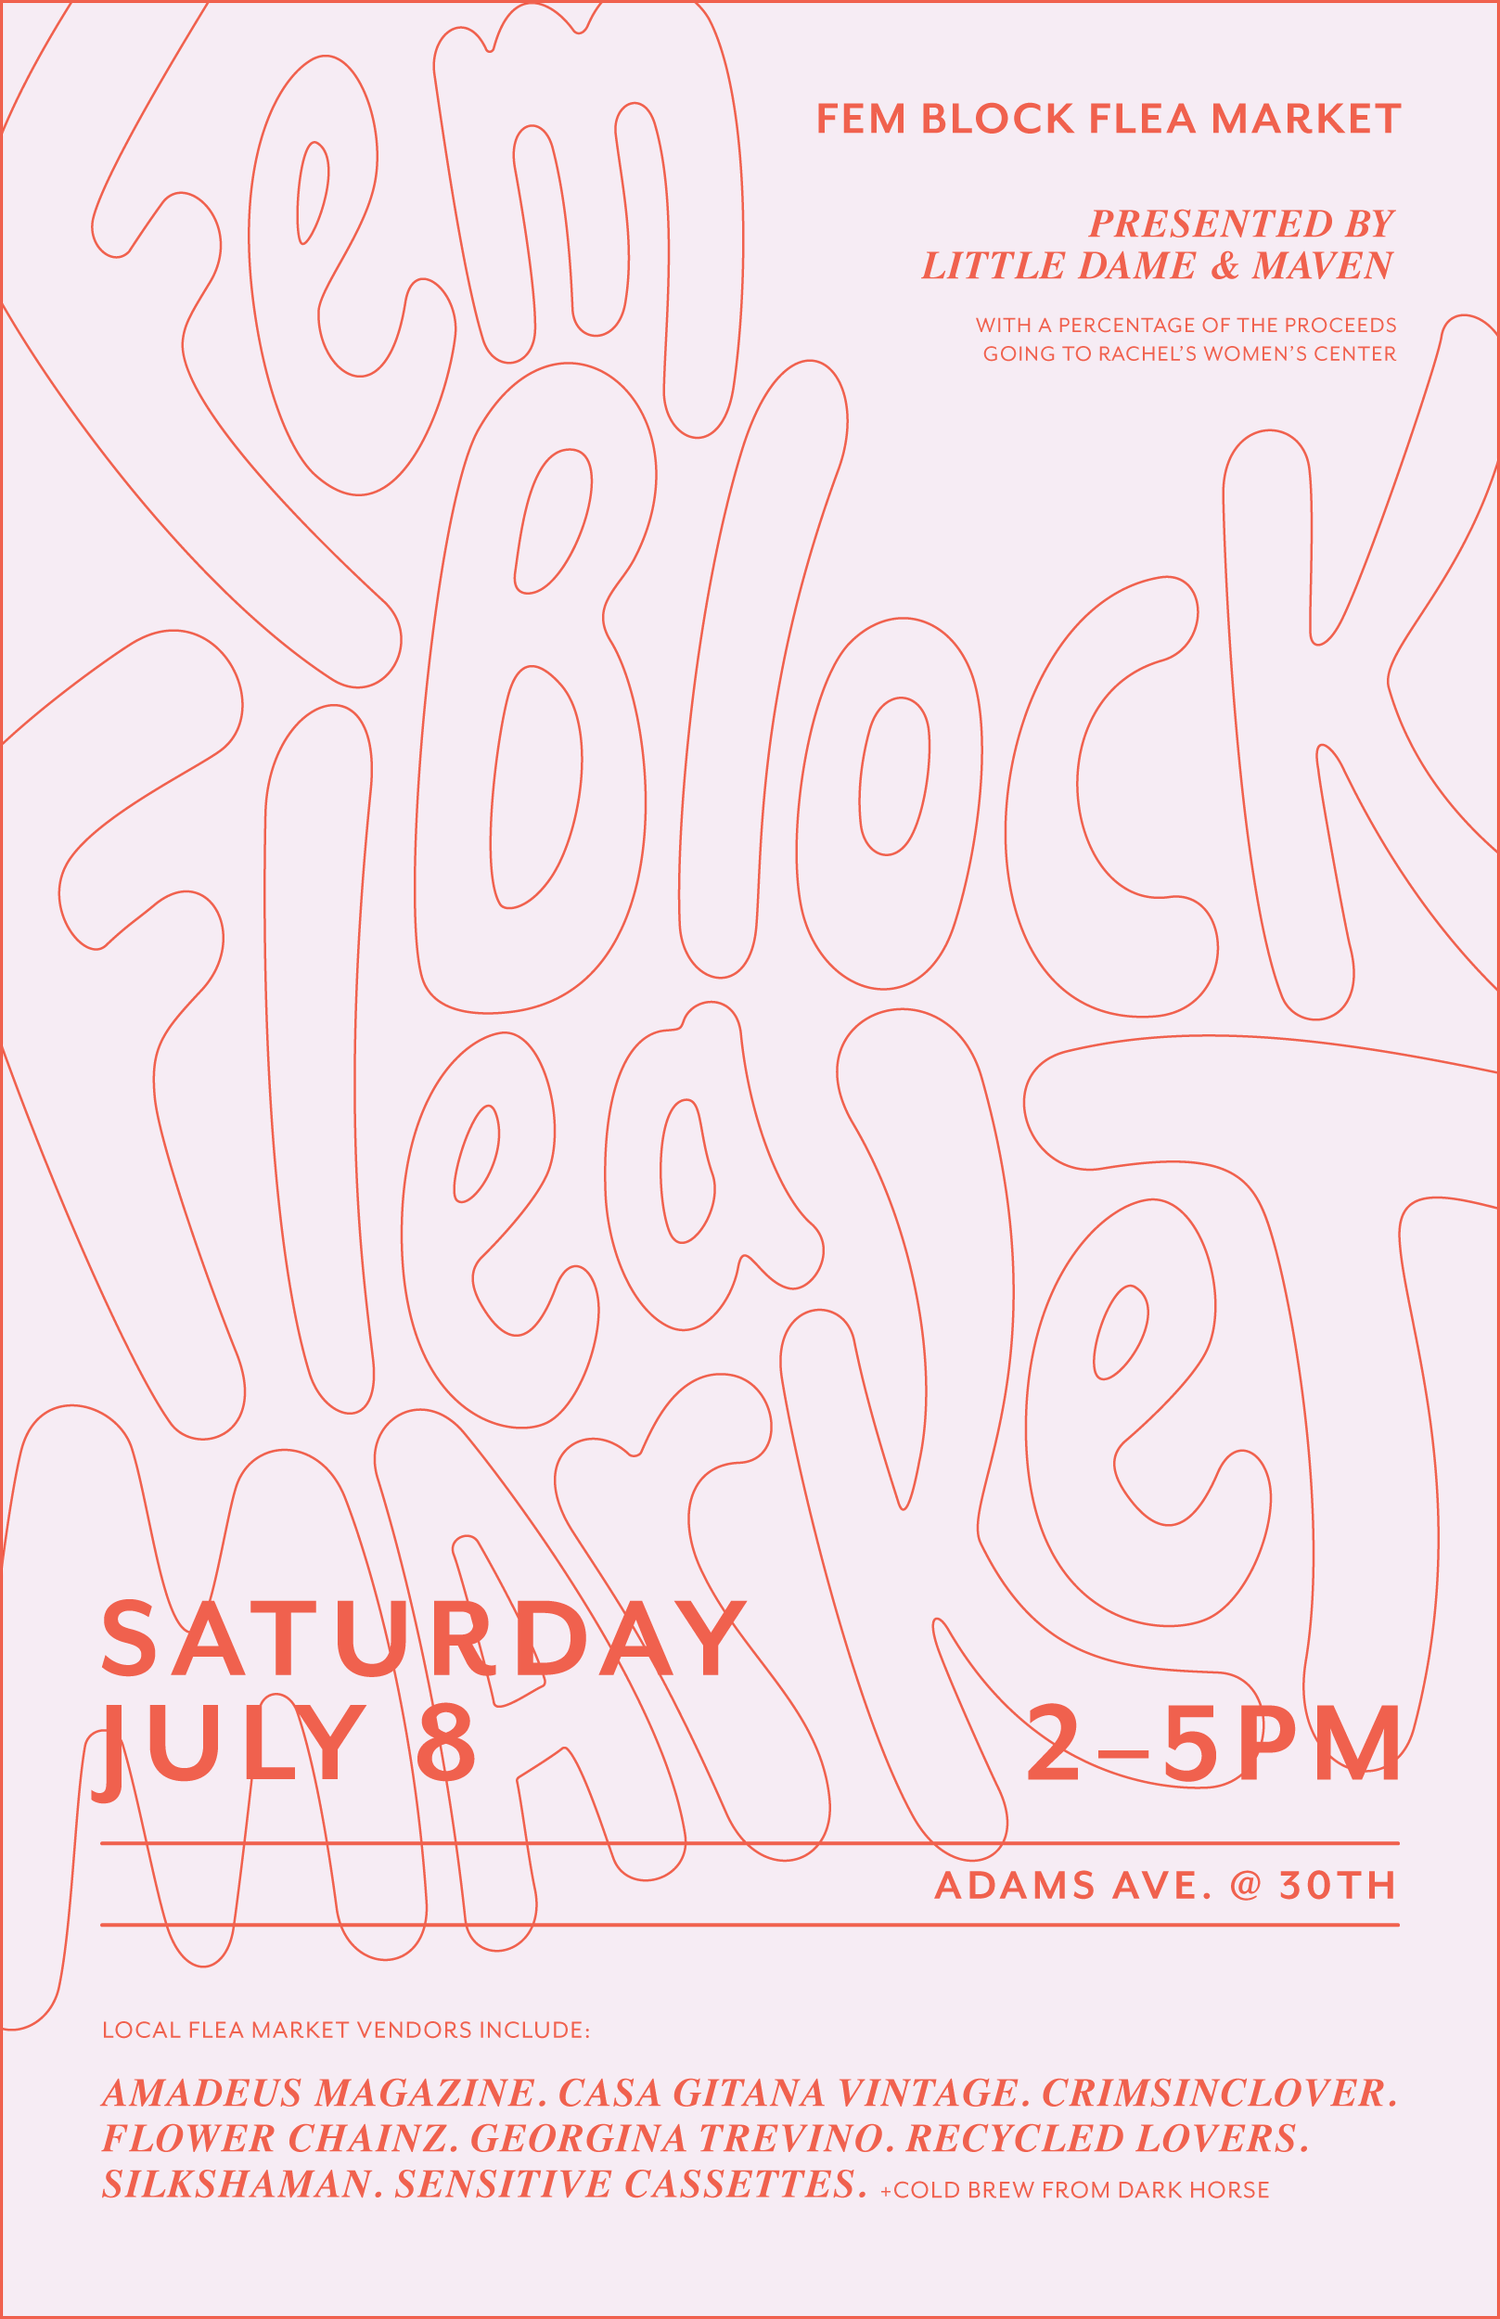 fem-block-flea-market-poster